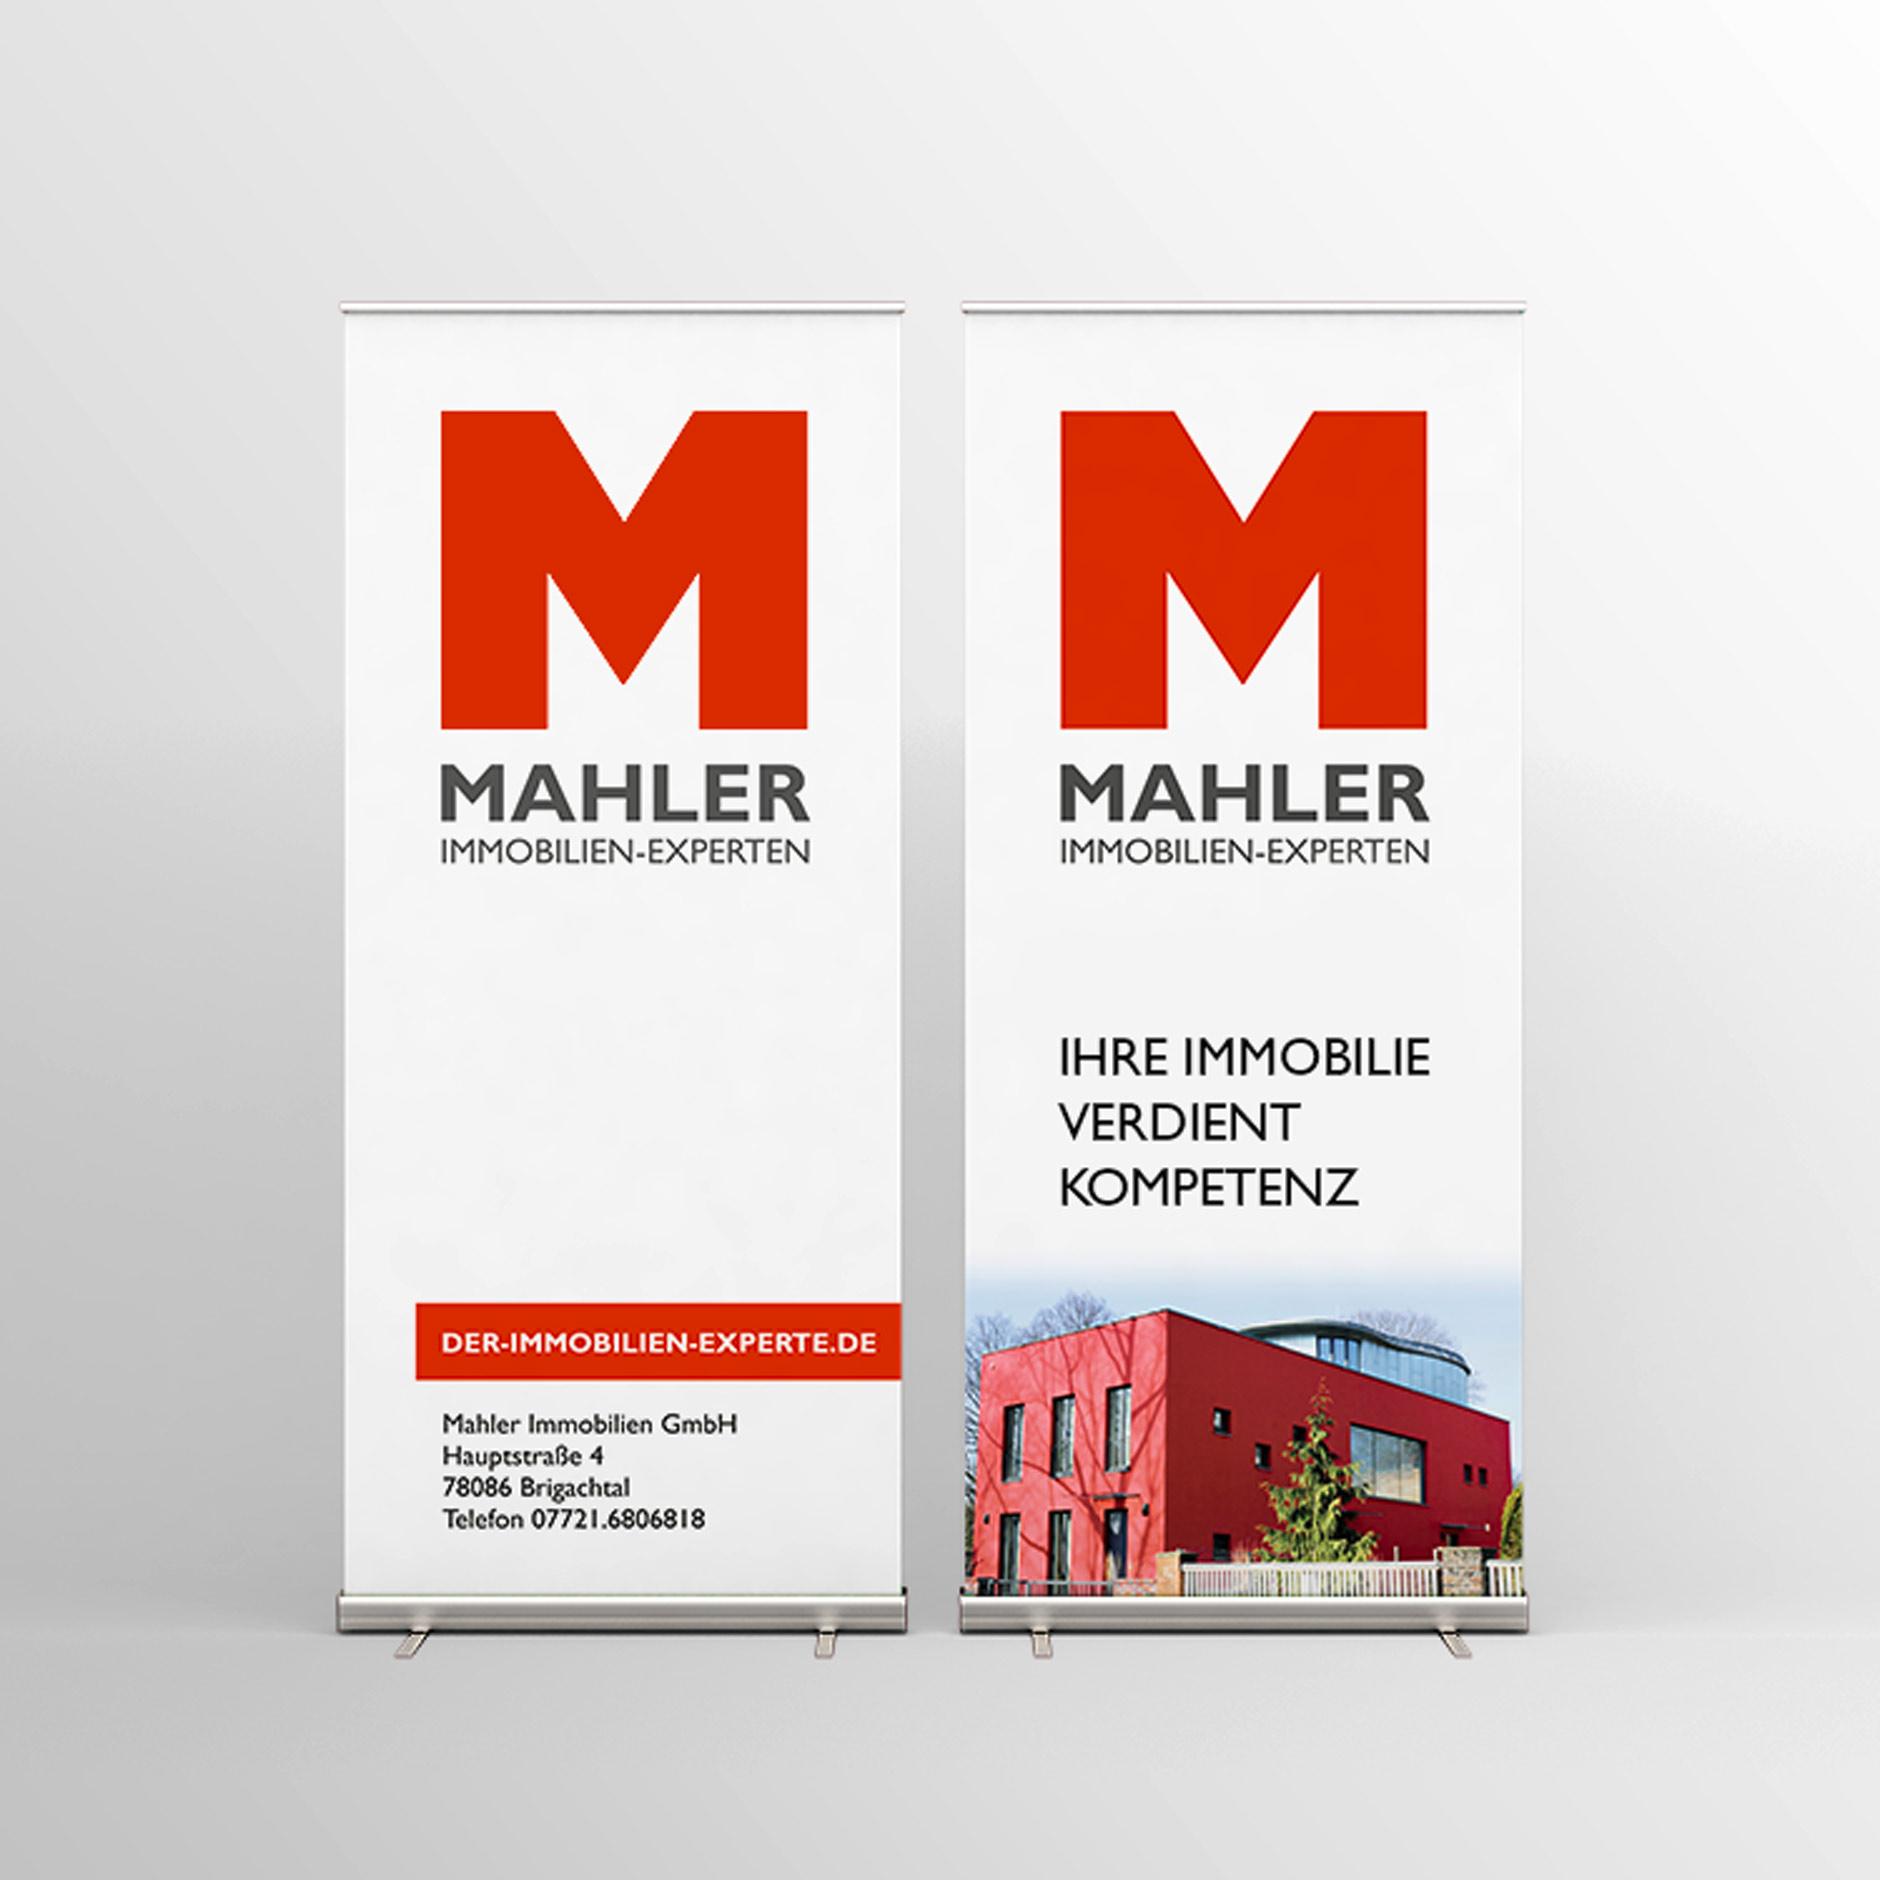 Gestaltung Rollup-Display für MAHLER IMMOBILIEN